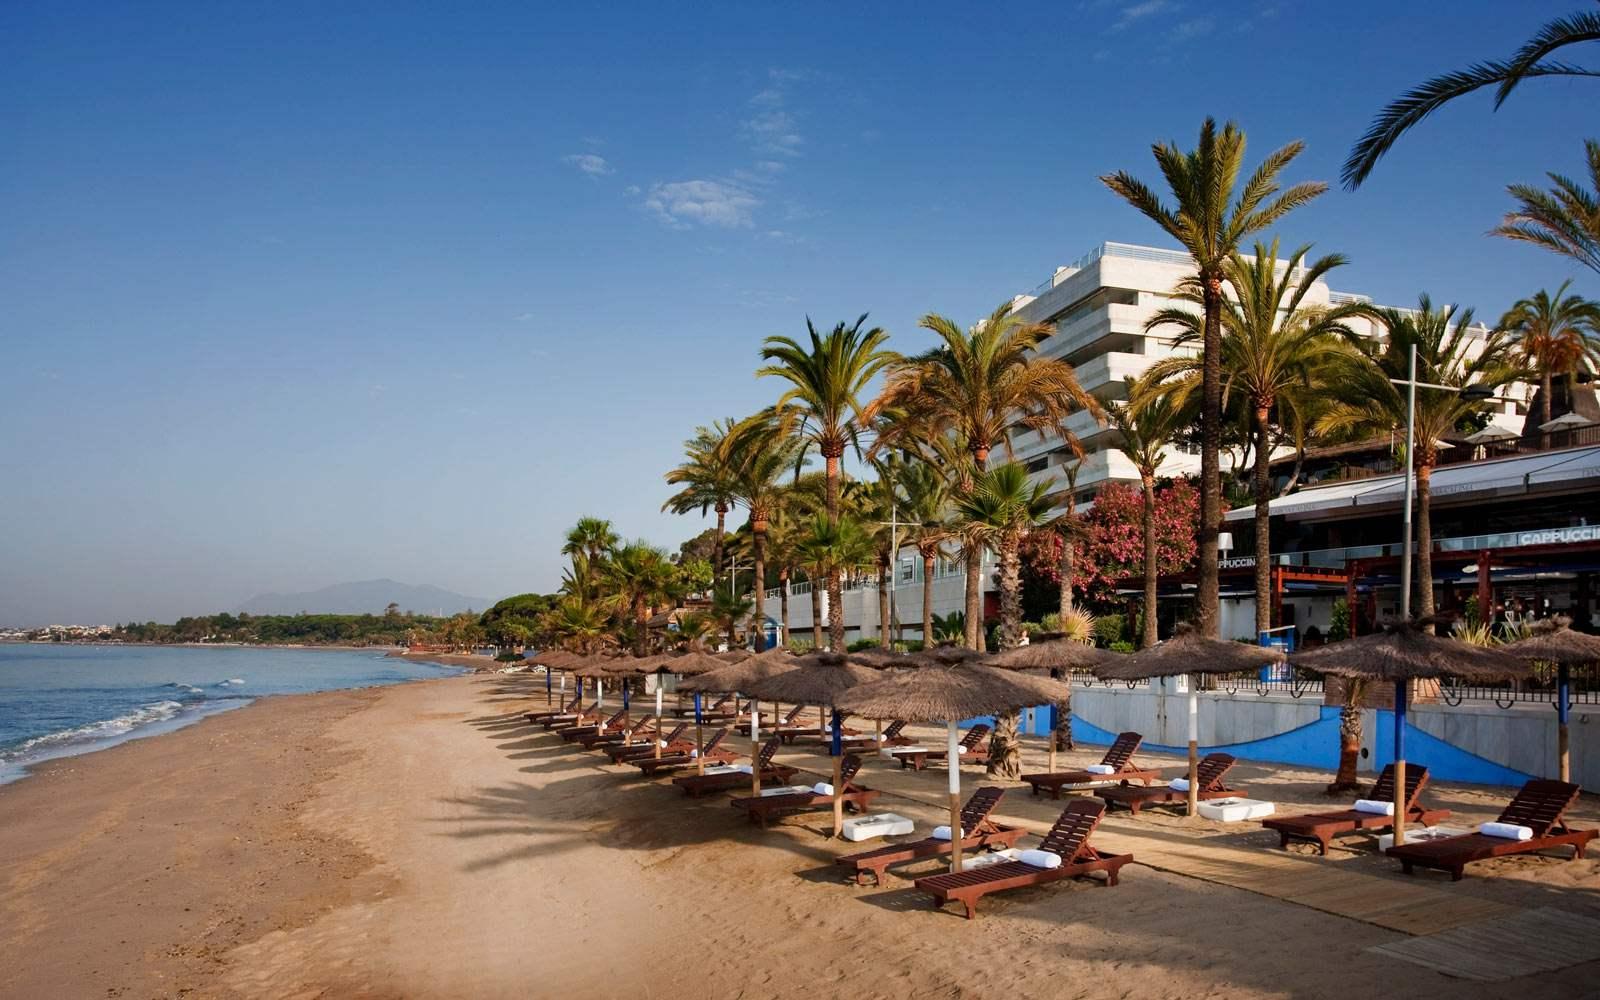 Hotel Gran Melia Don Pepe - Beach